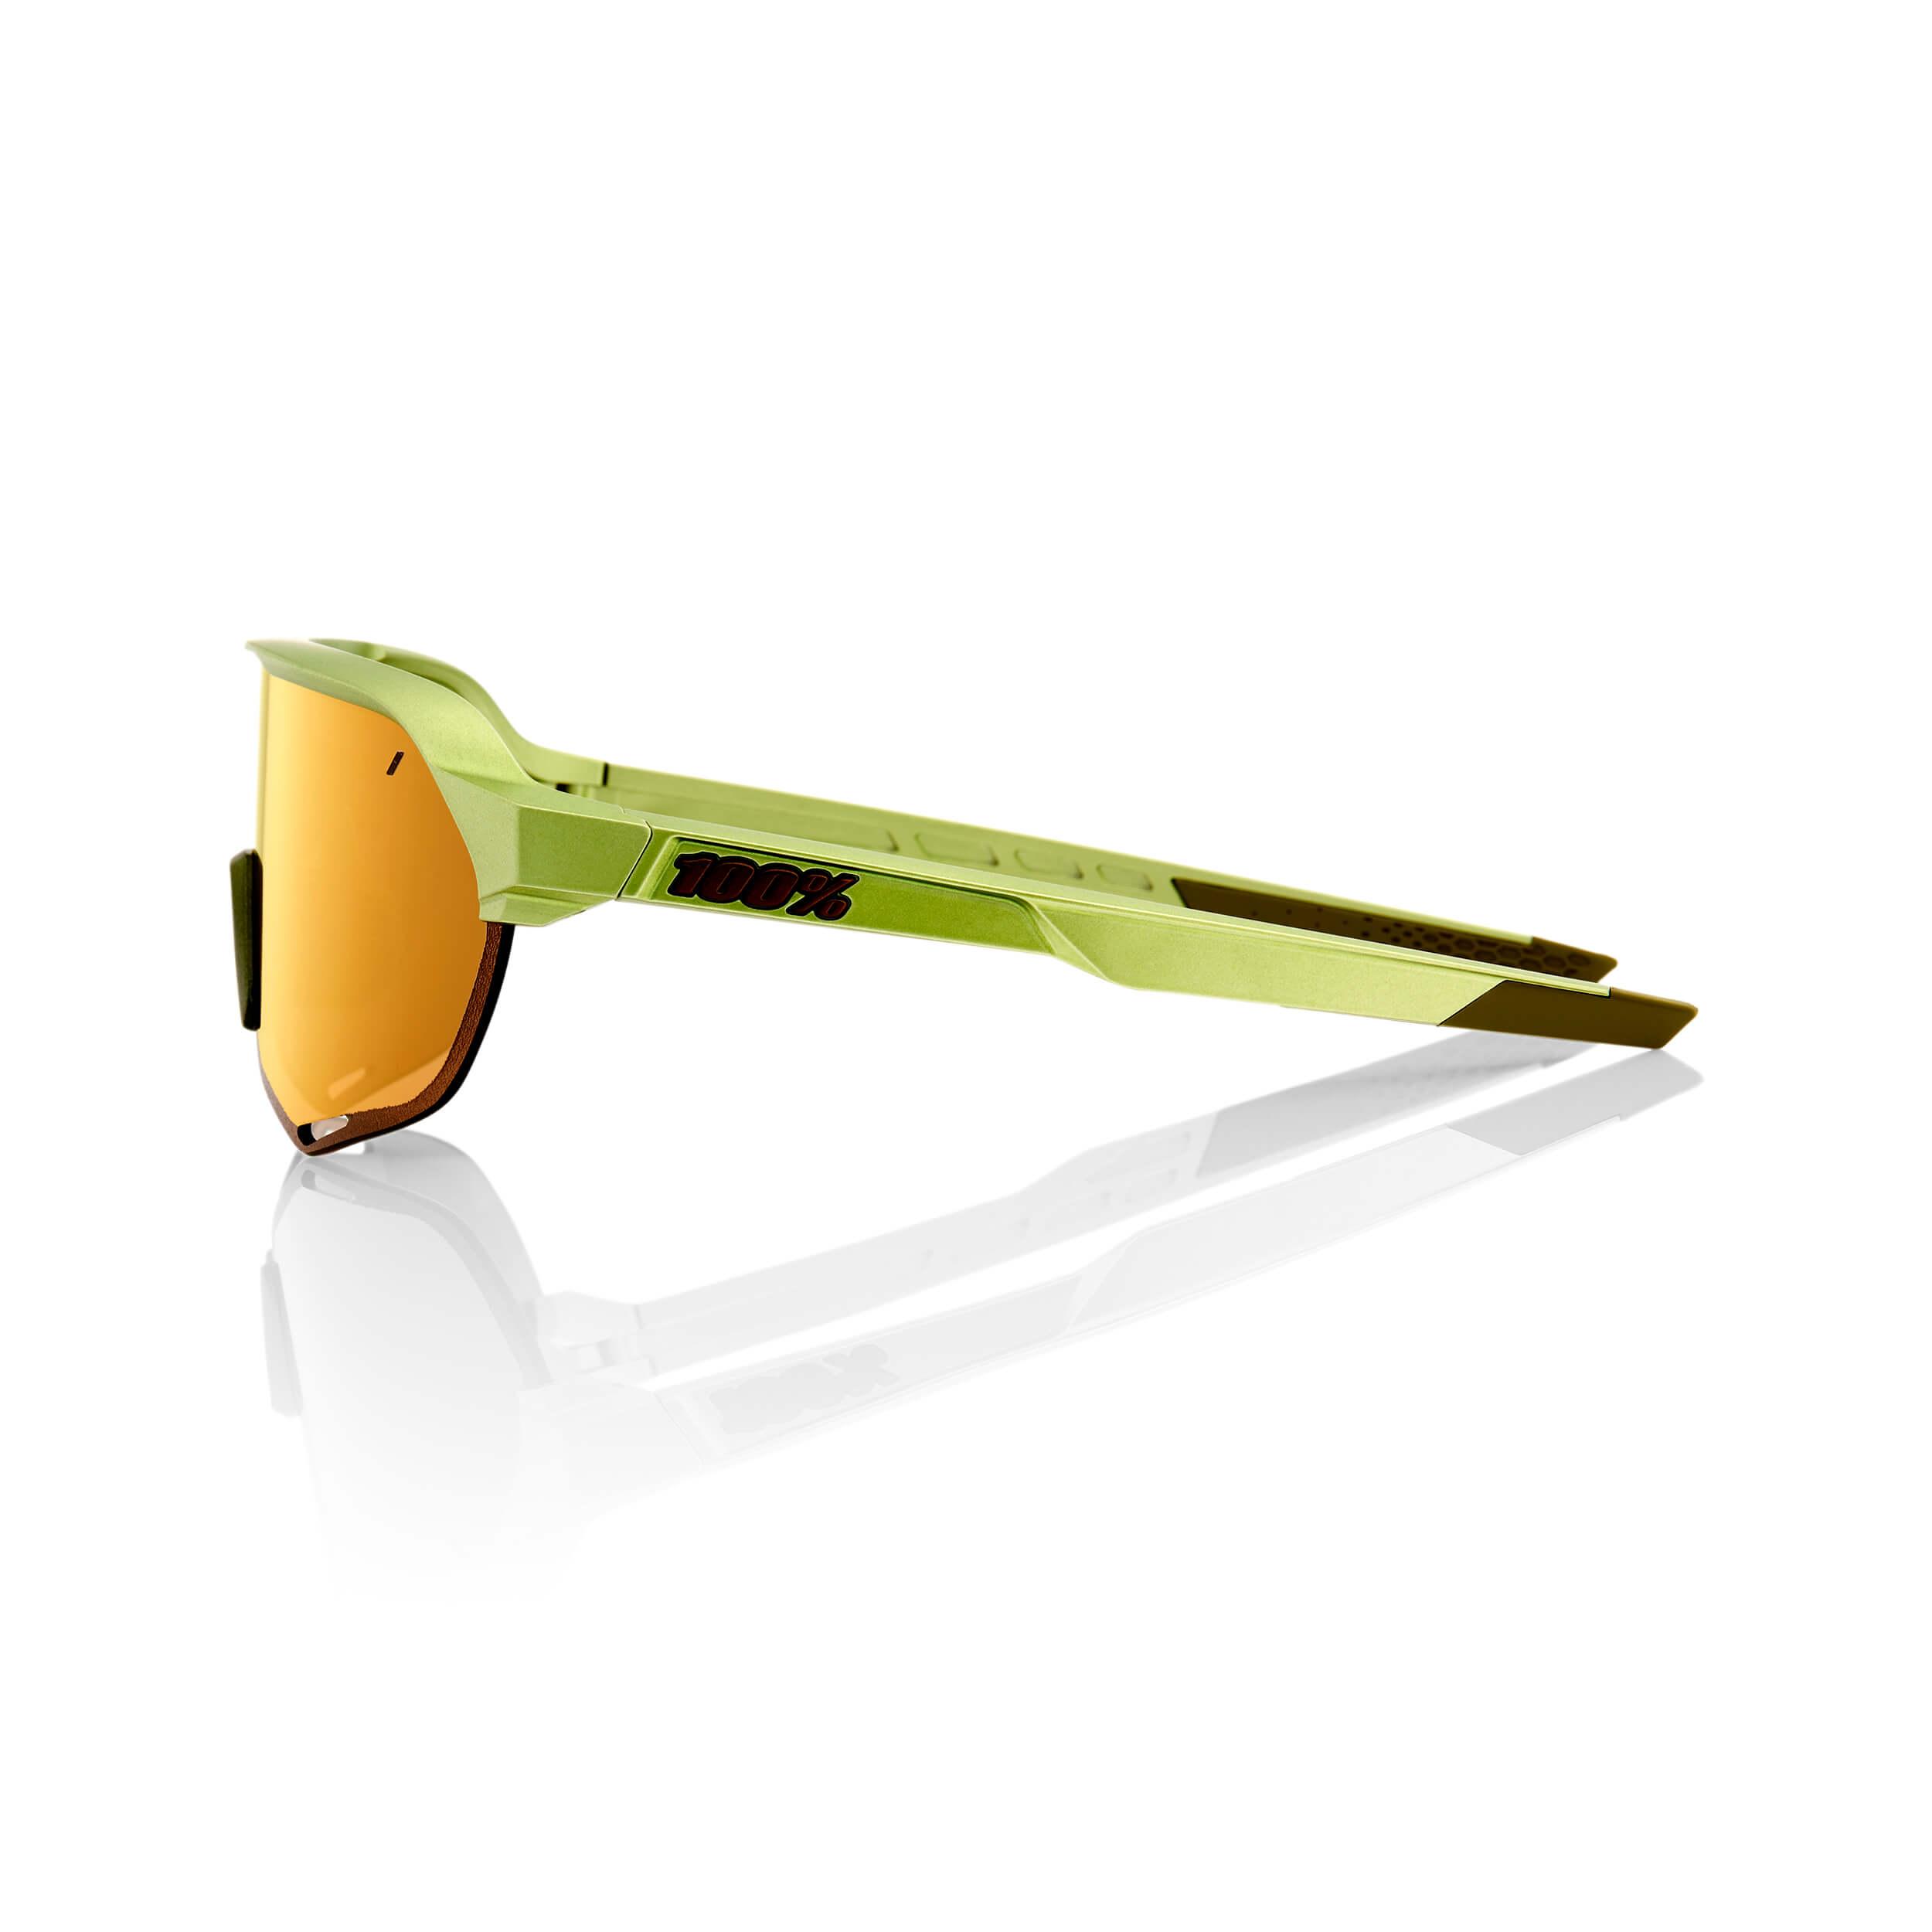 S2 – Matte Metallic Viperidae – Bronze Multilayer Mirror Lens